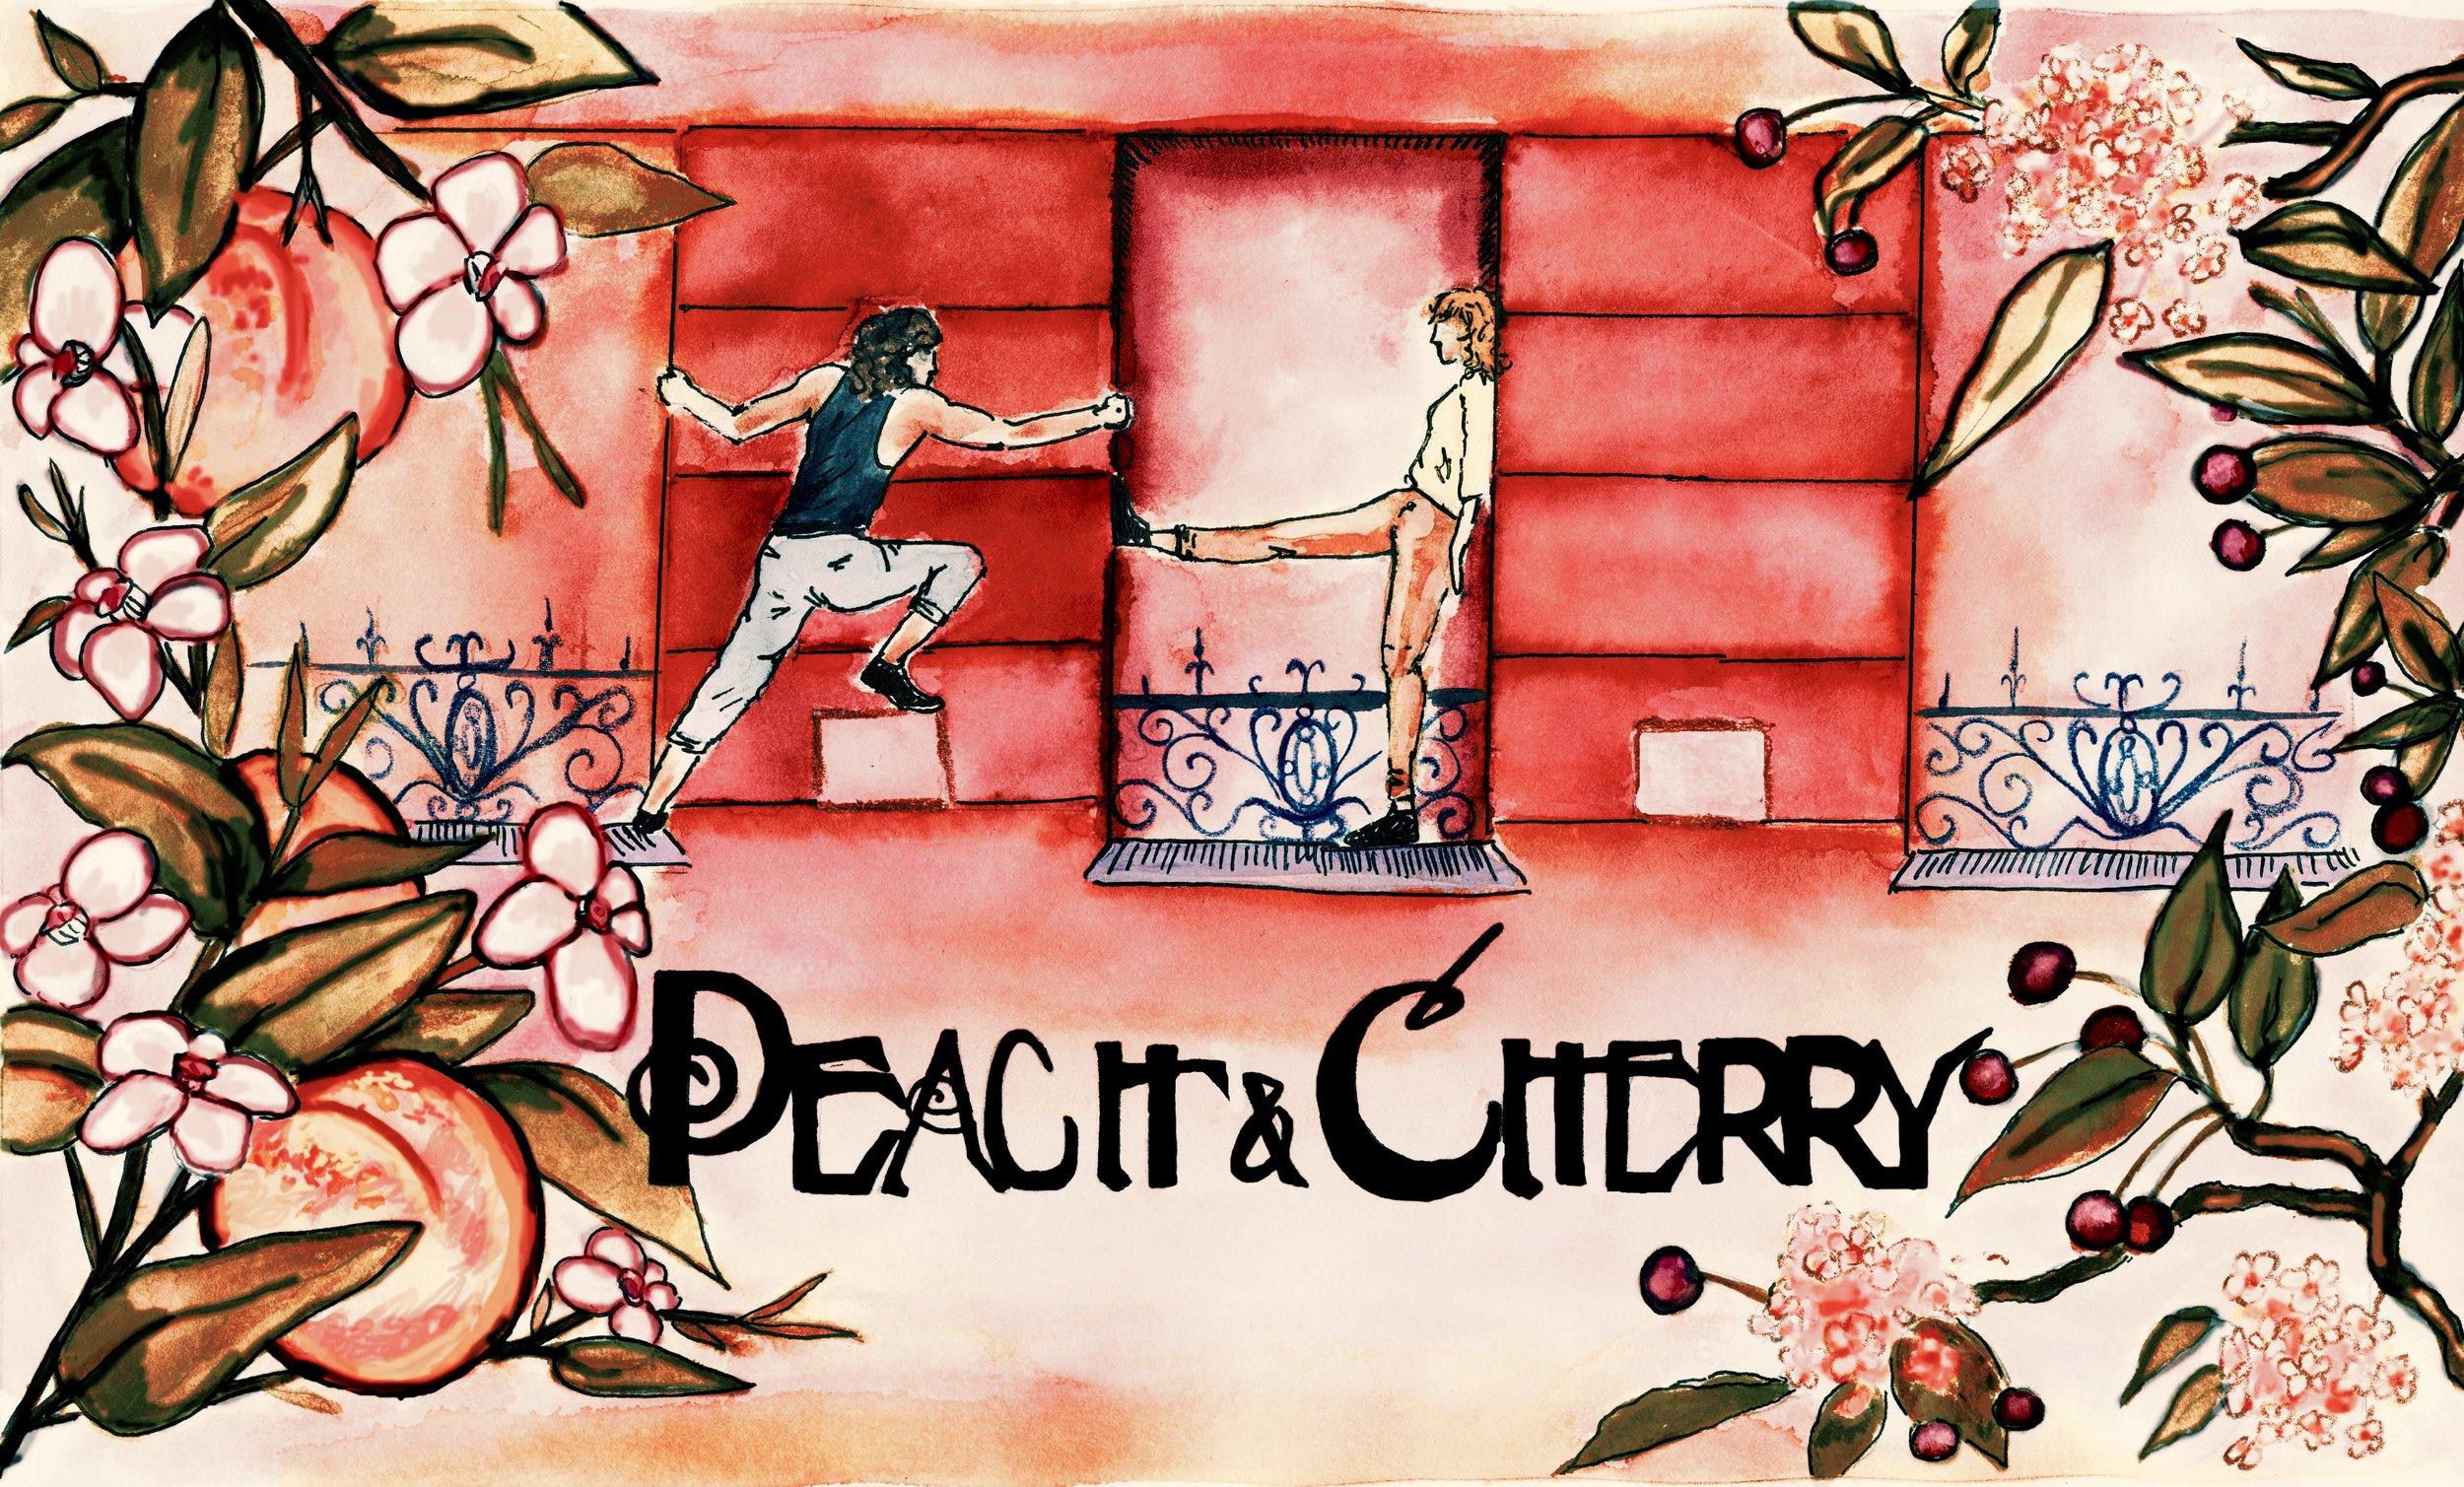 Peach & Cherry